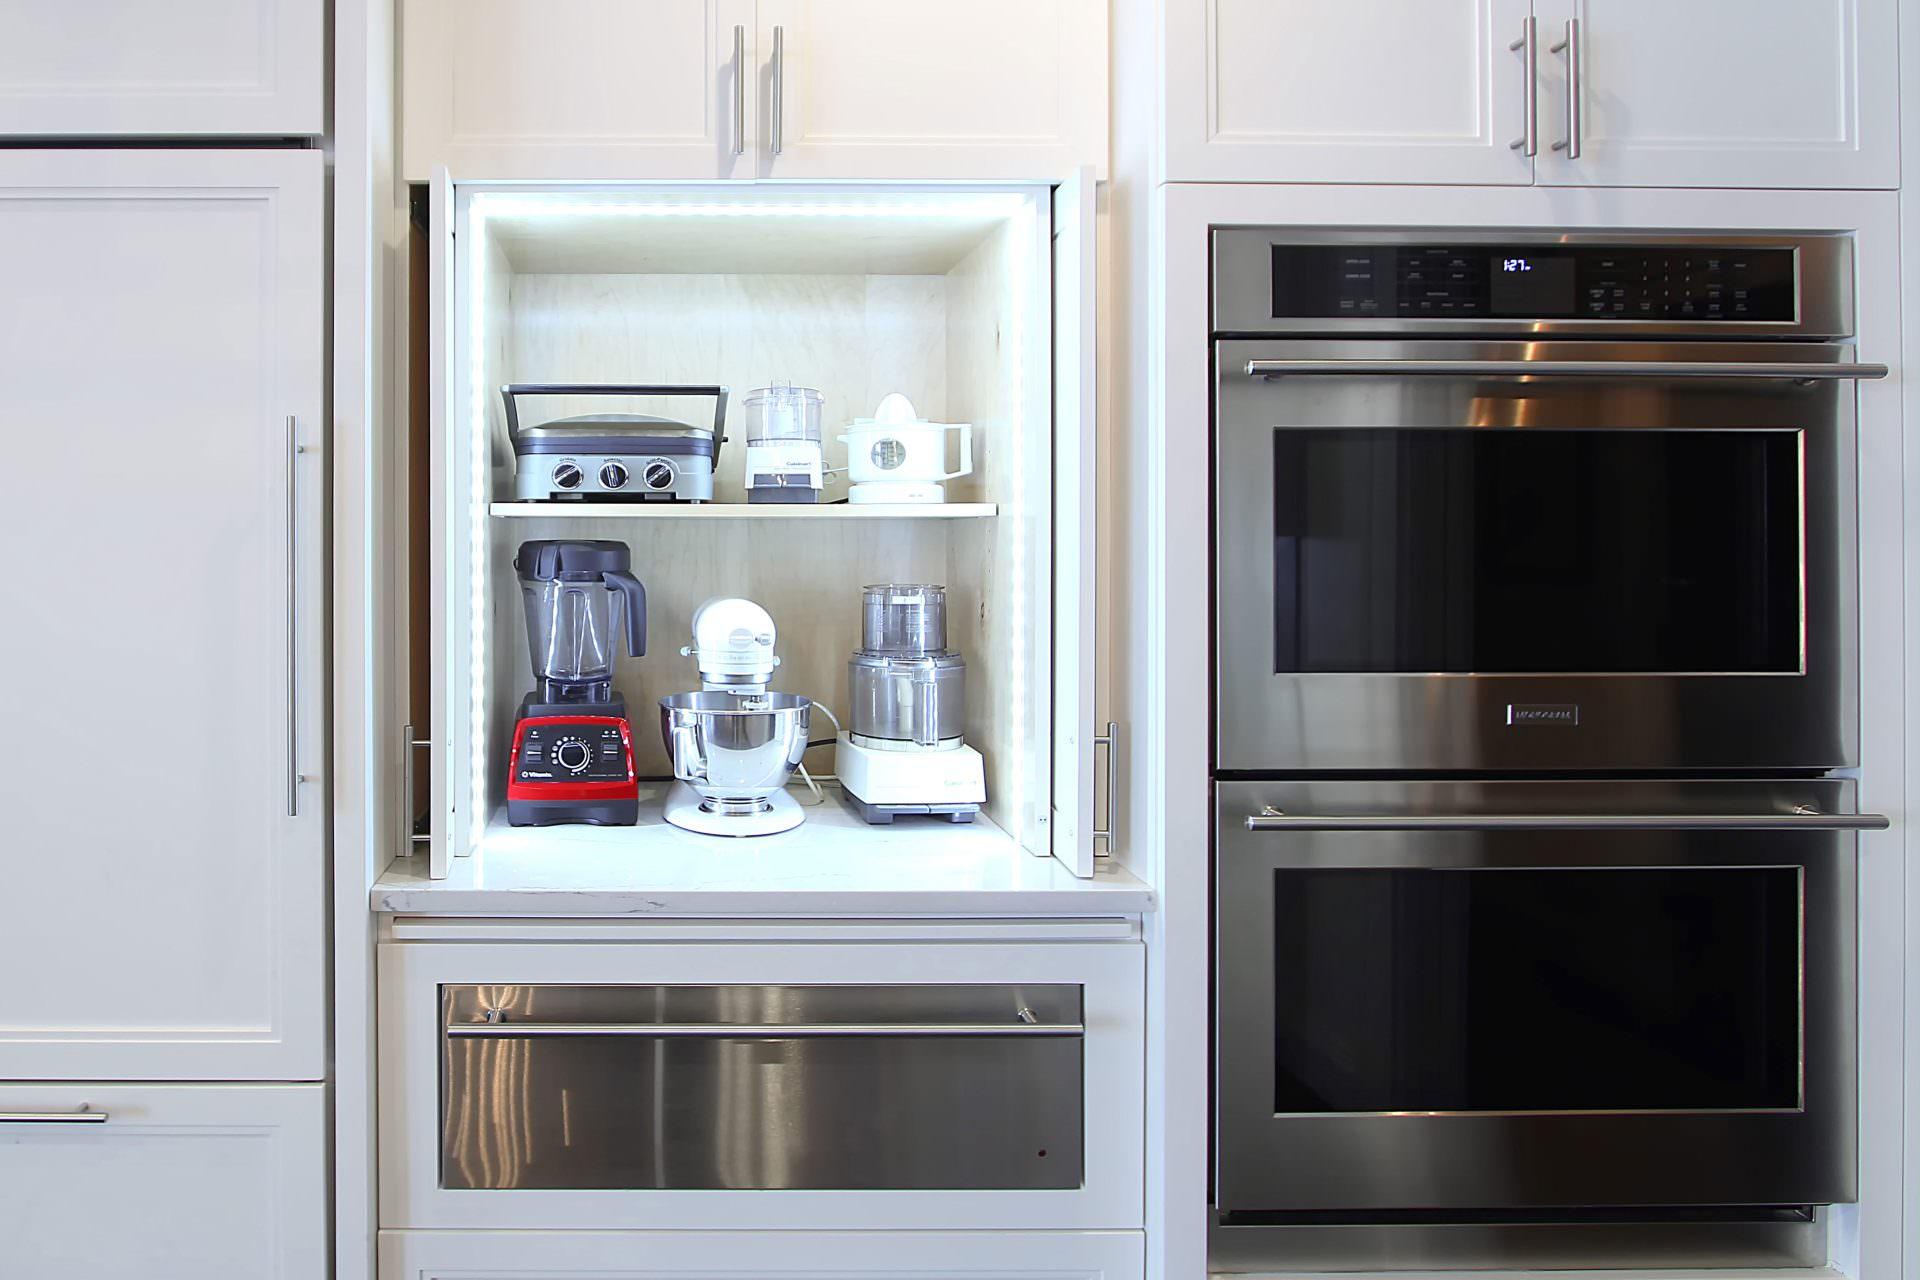 Double Oven Warming Drawer Pocket Doors Led Strip Lighting Hidden